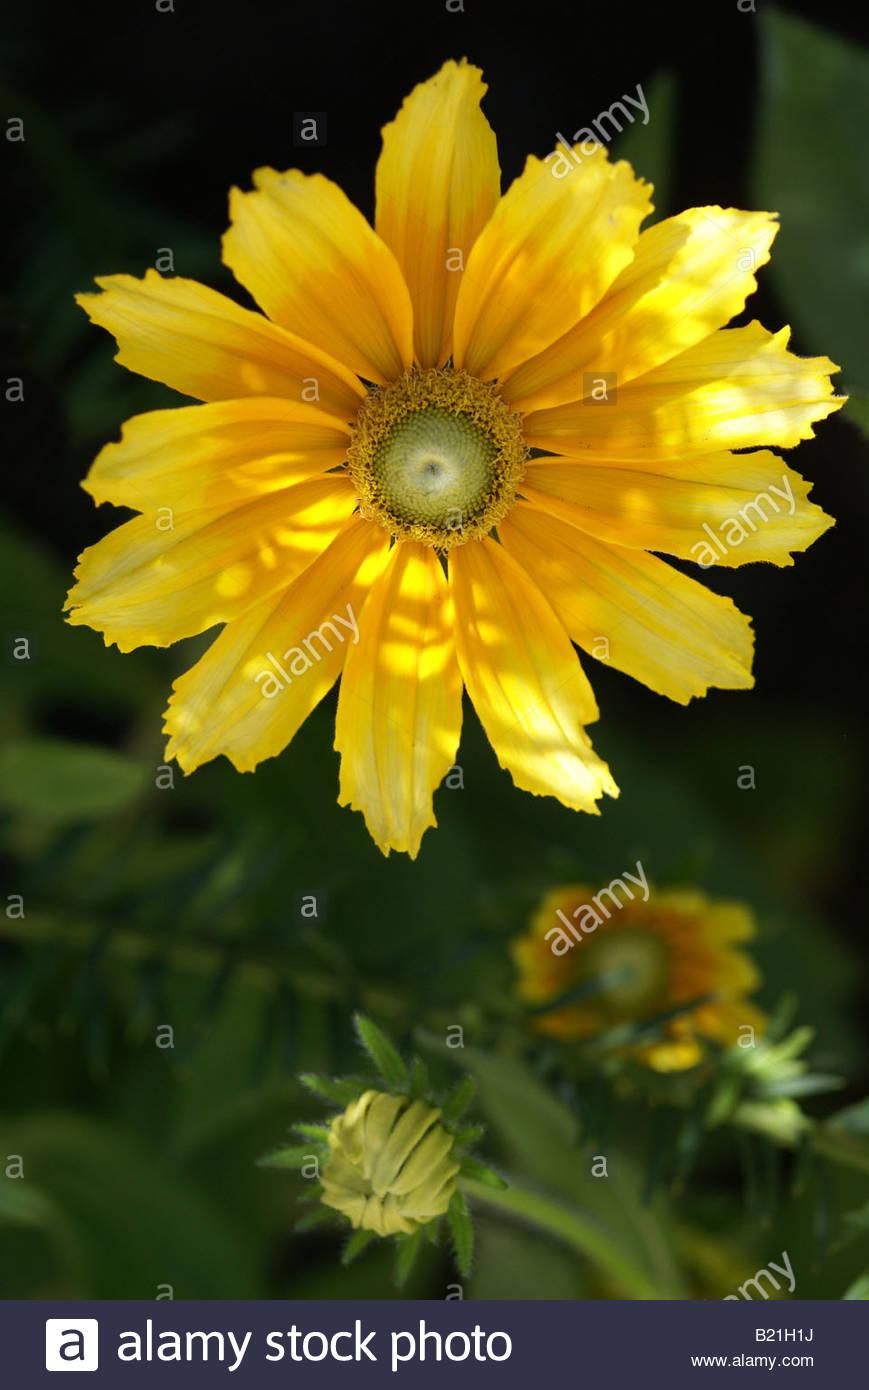 yellow-rudbeckia-B21H1J.jpg